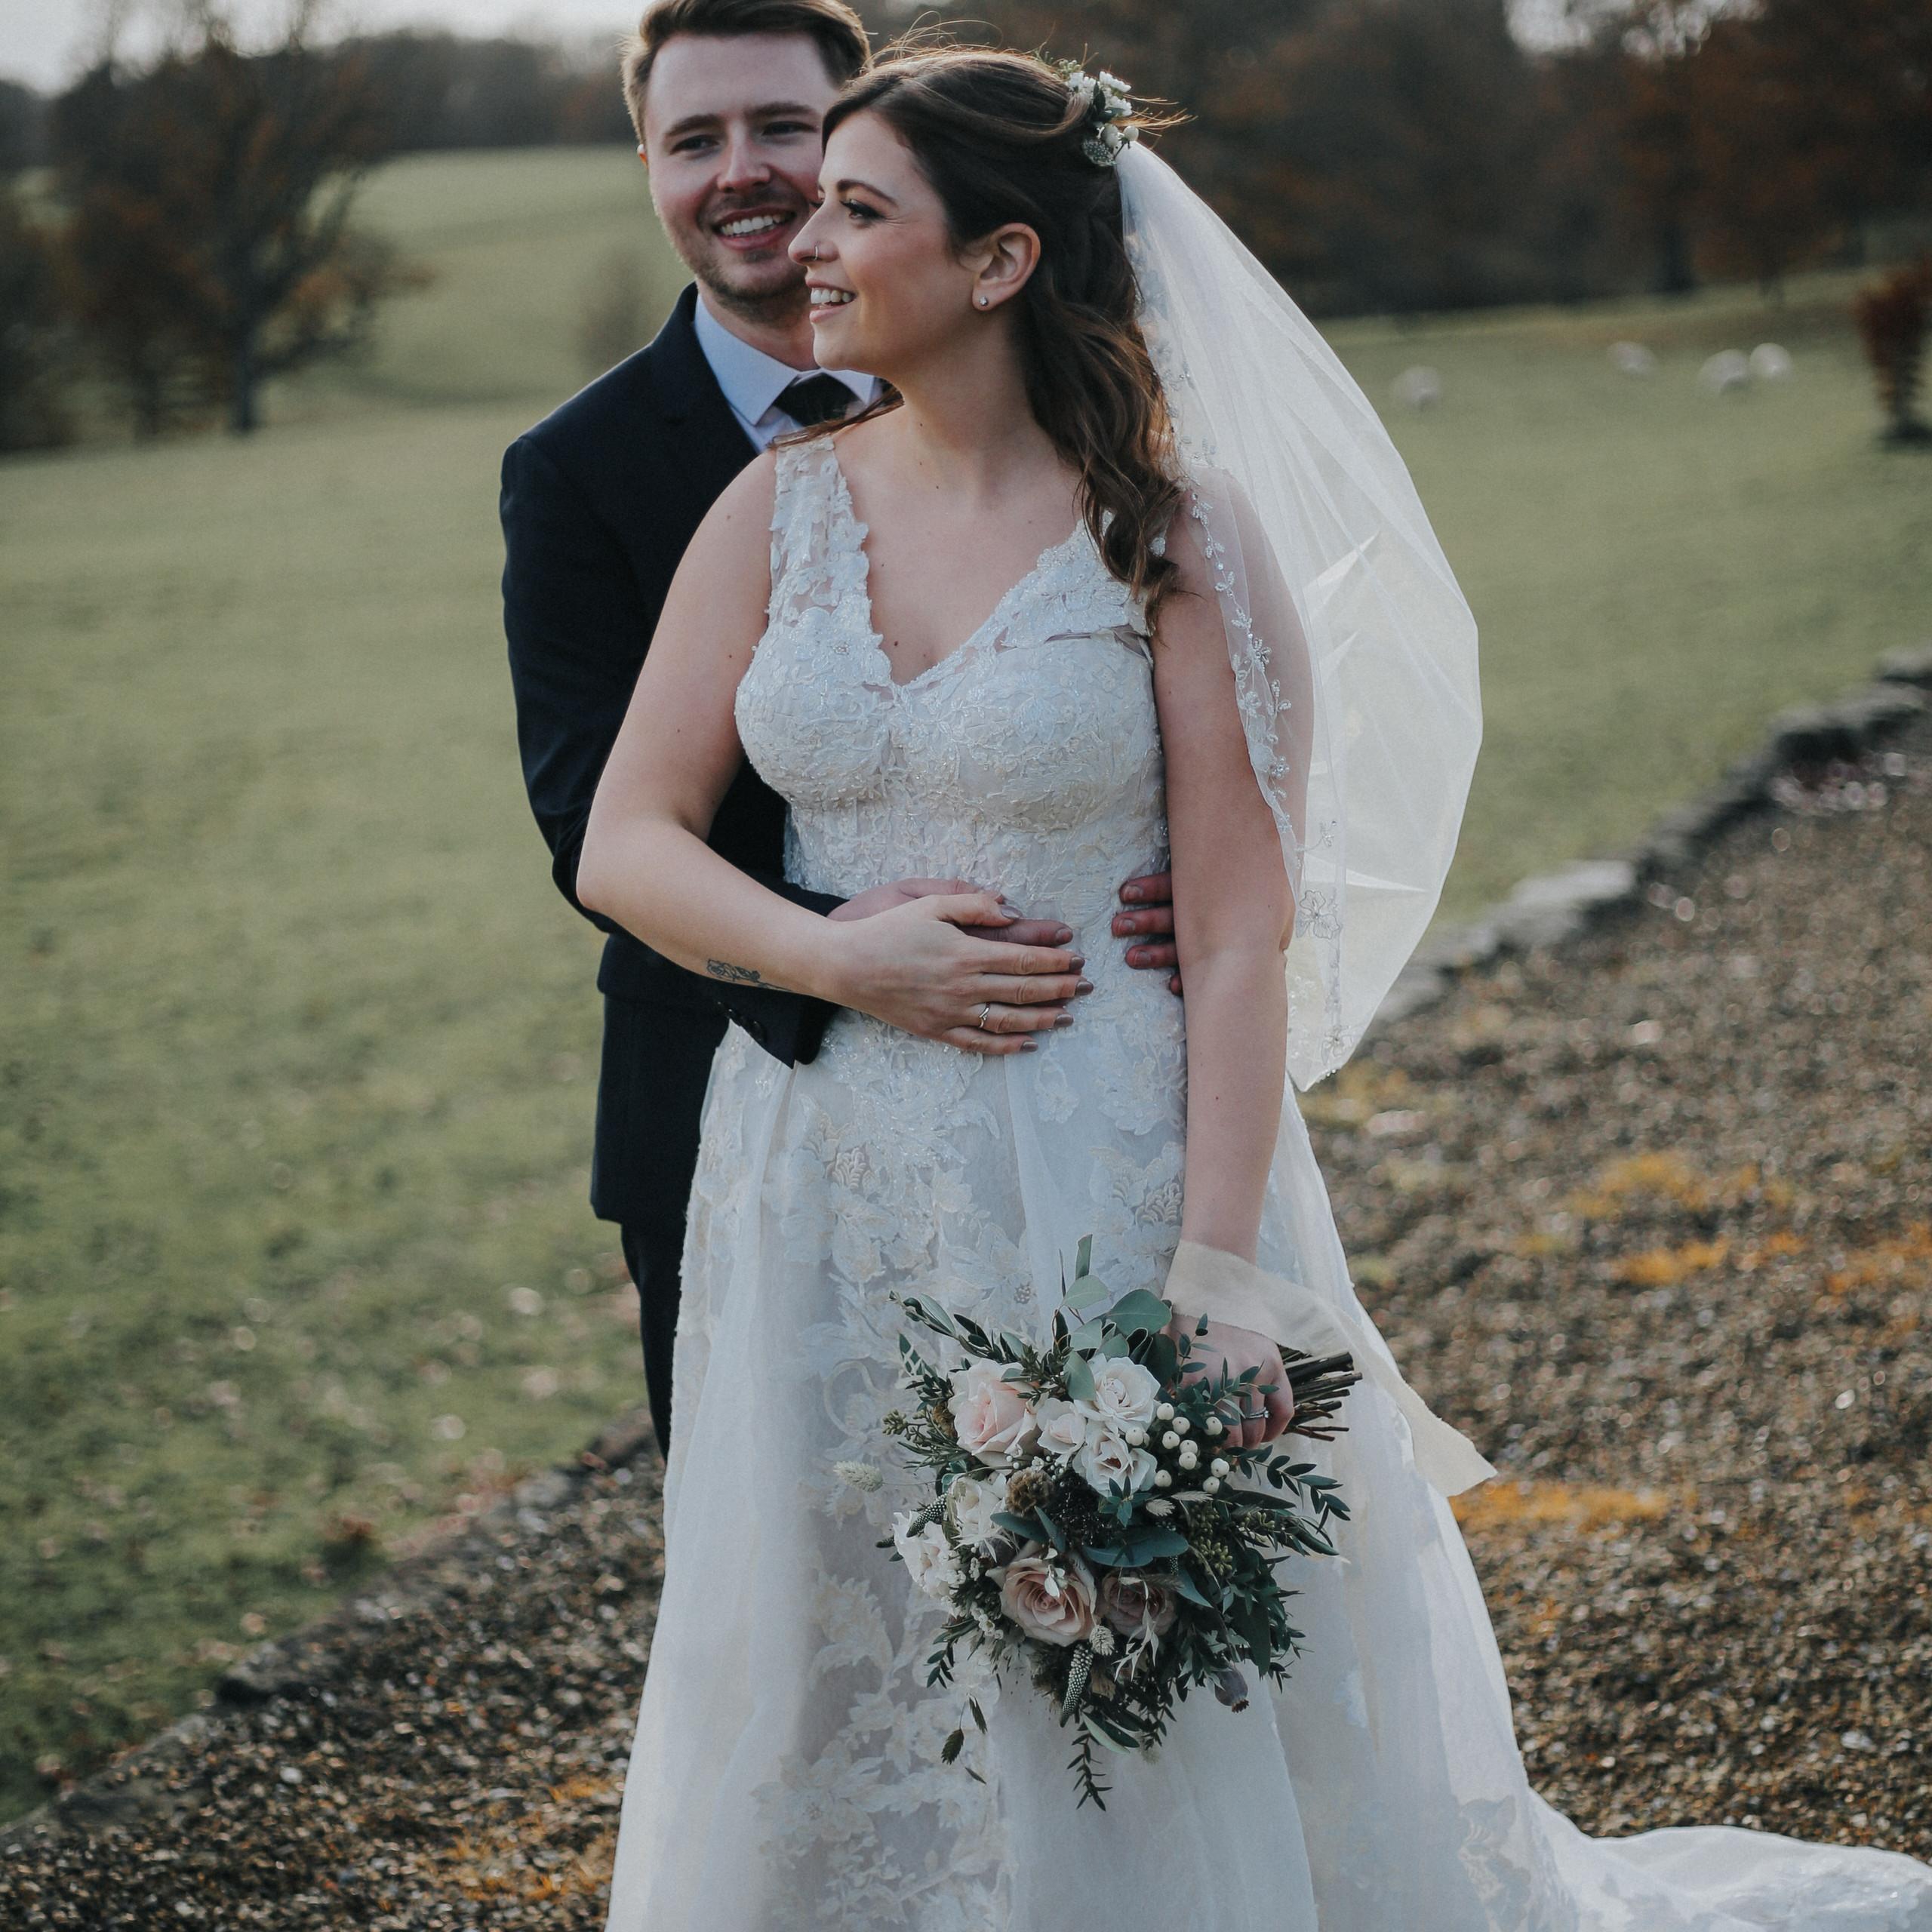 Bride and groom look nonchalantly across wedding grounds of Wadhurst Castle